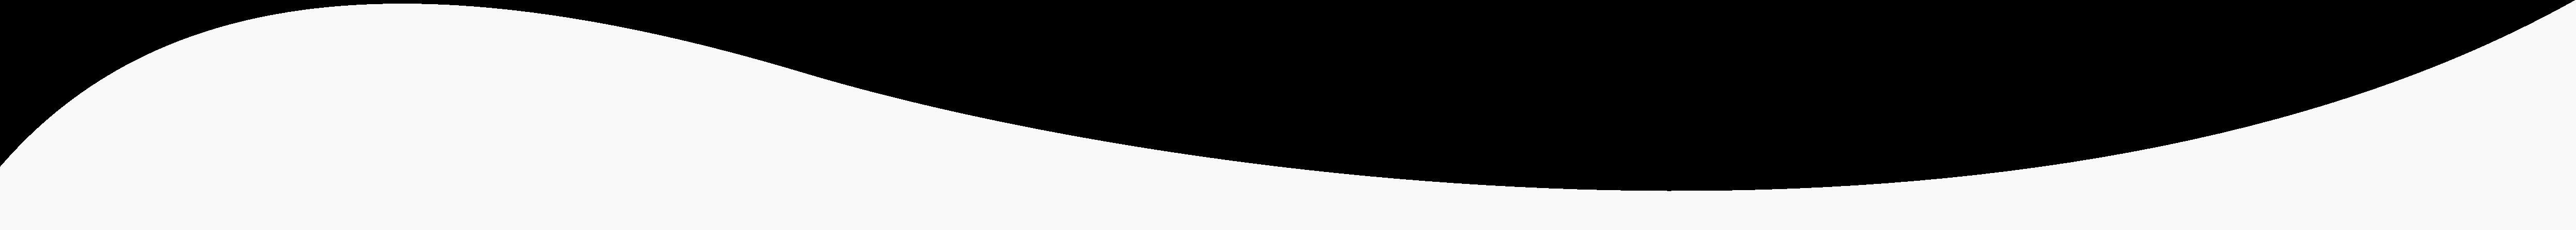 hero-wave-gray